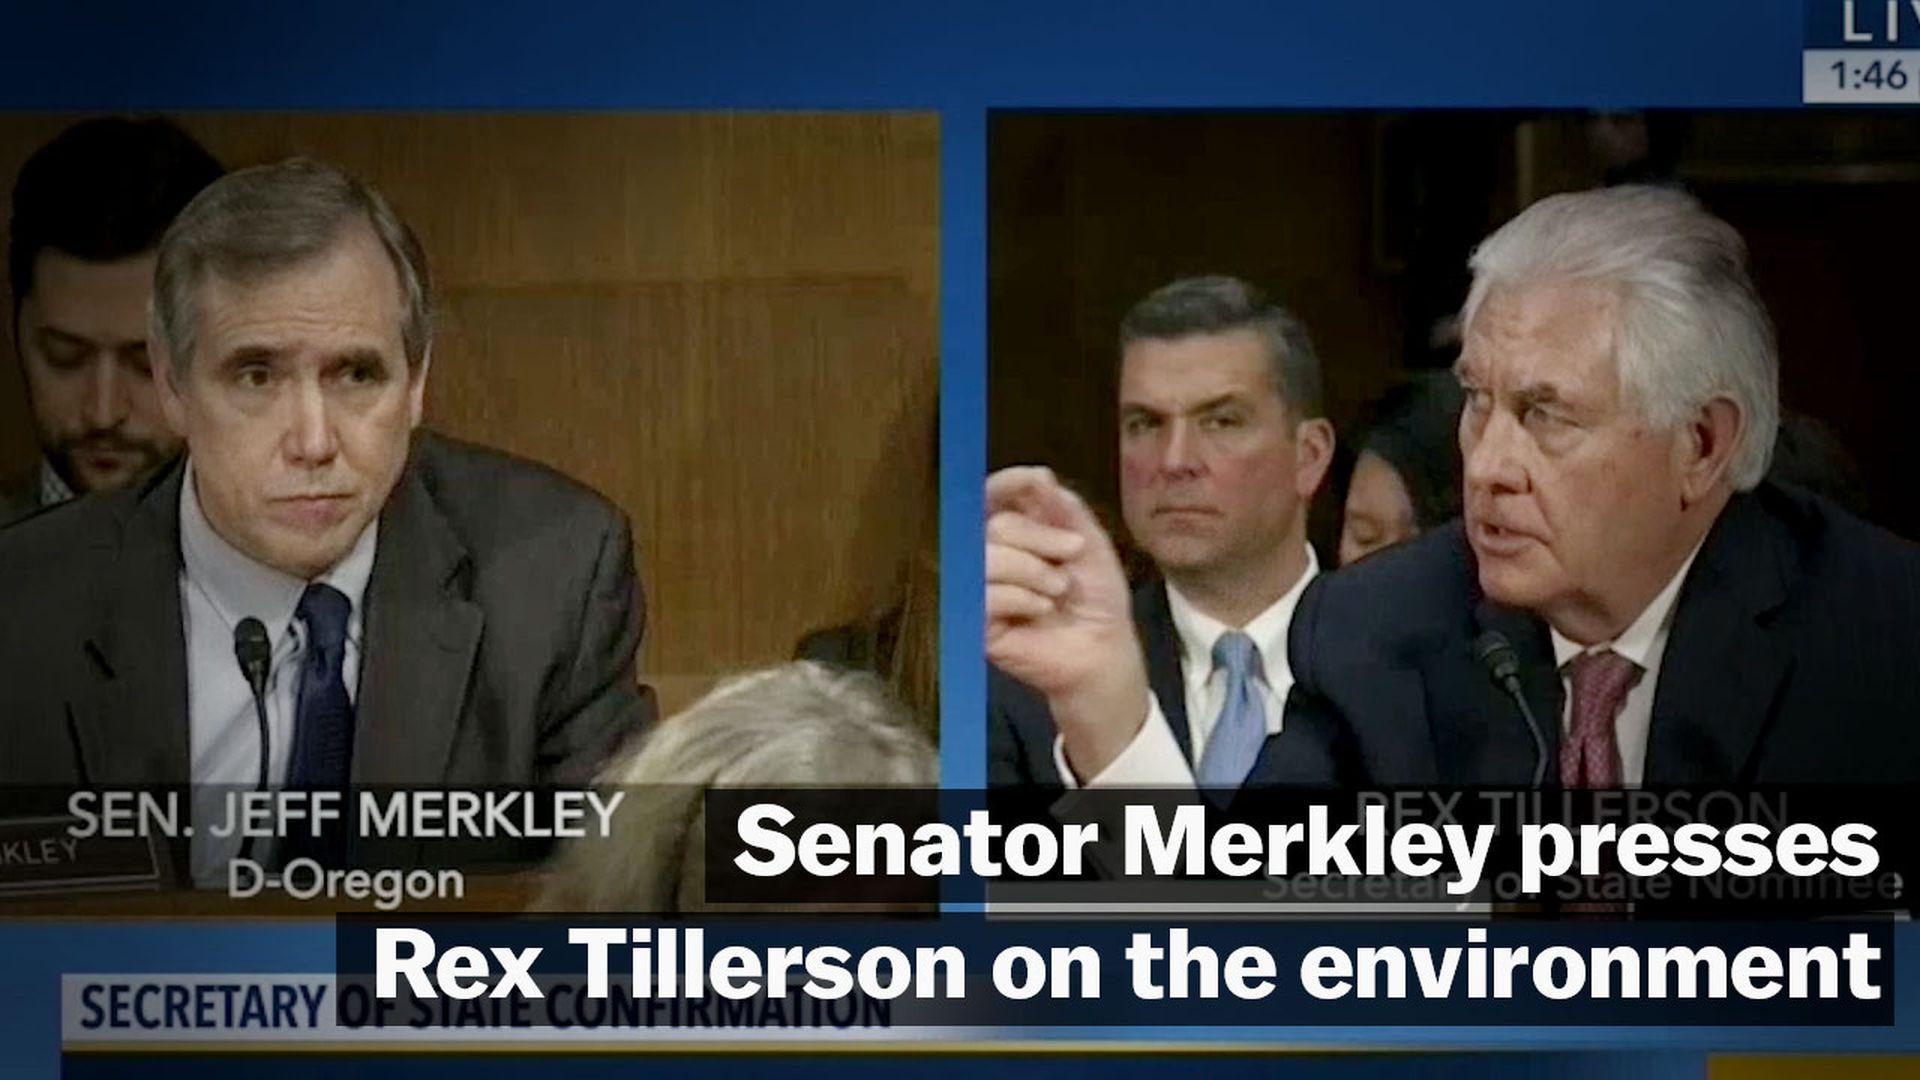 Sen. Jeff Merkley patiently exposed Rex Tillerson on climate change